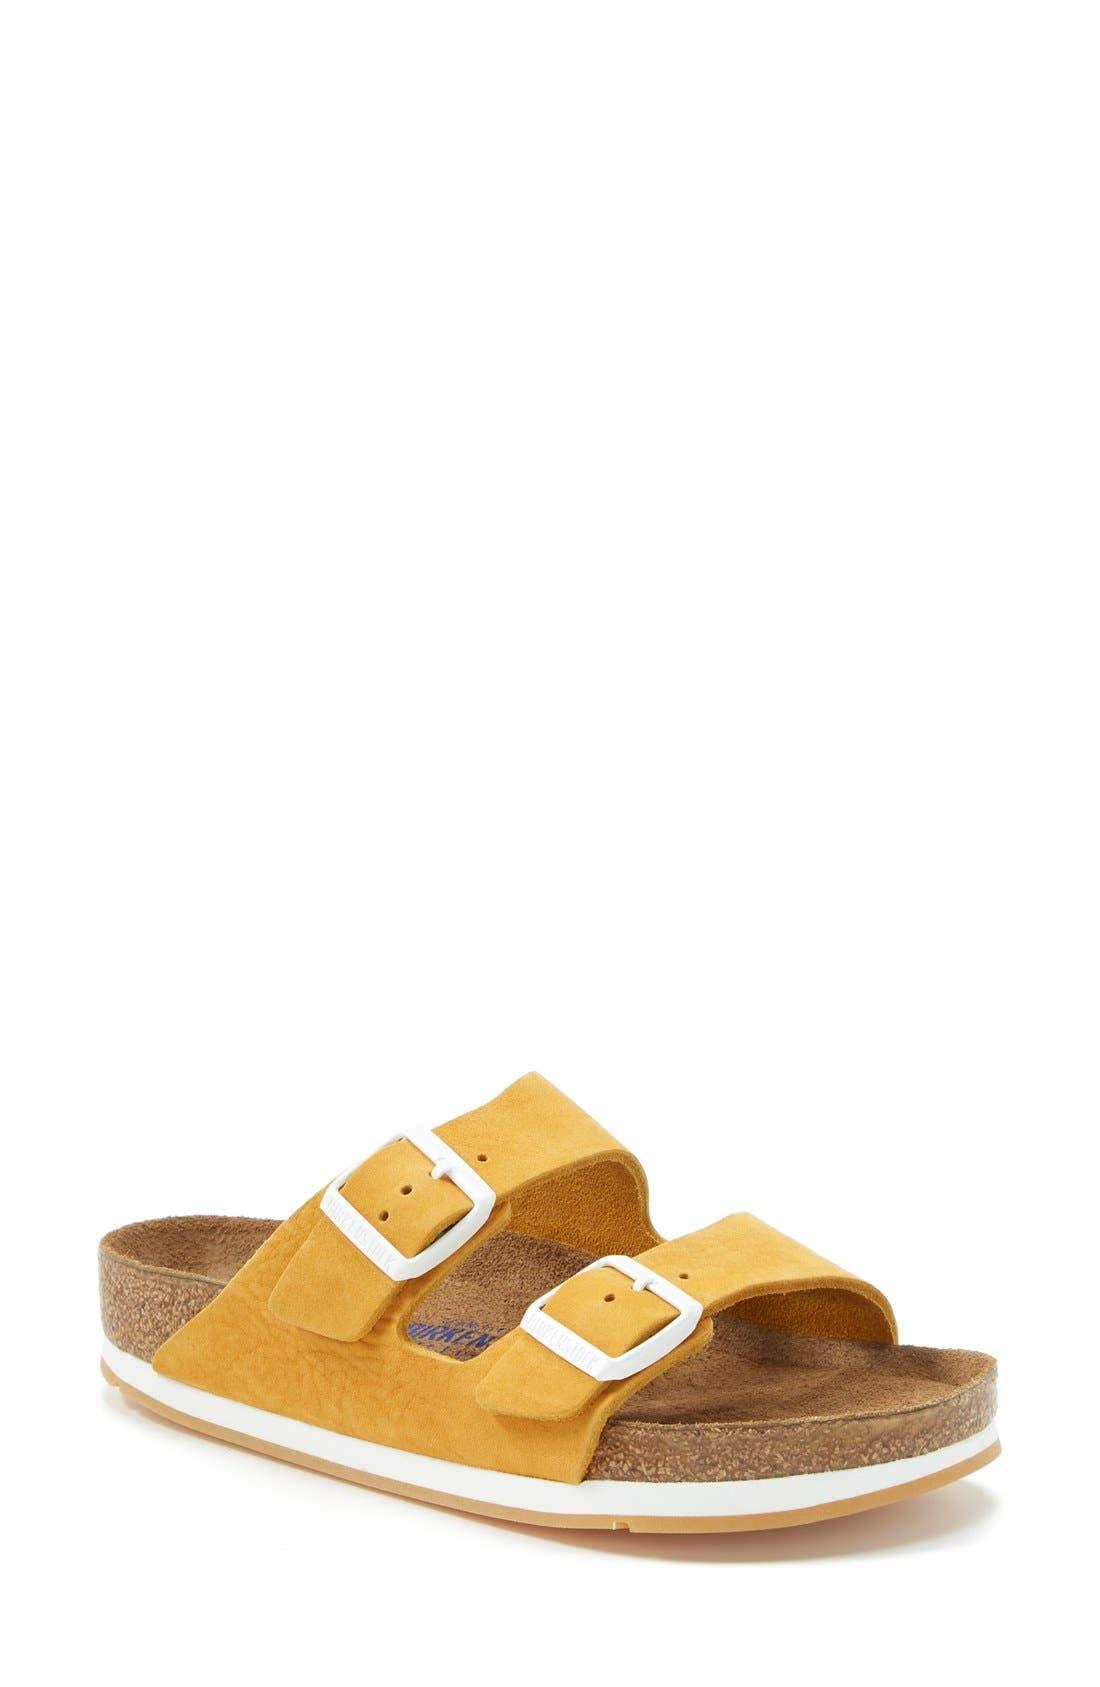 Alternate Image 1 Selected - Birkenstock 'Arizona' Soft Footbed Sandal (Women)